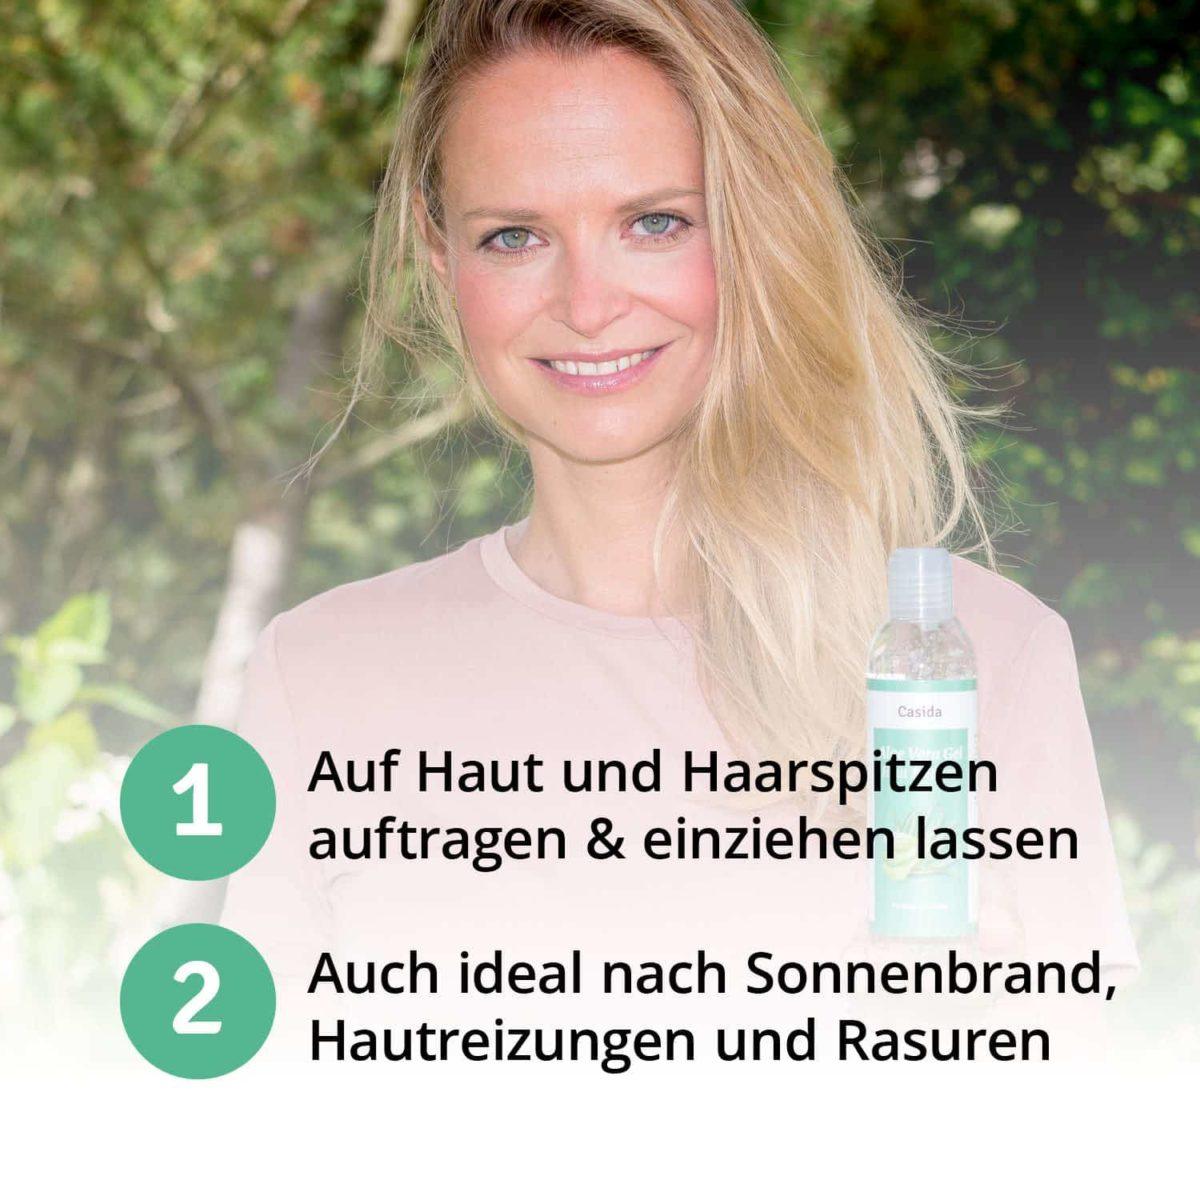 Casida Aloe Vera Gel Haut & Haare 16573212 PZN Apotheke Hautpflege After Sun (6)